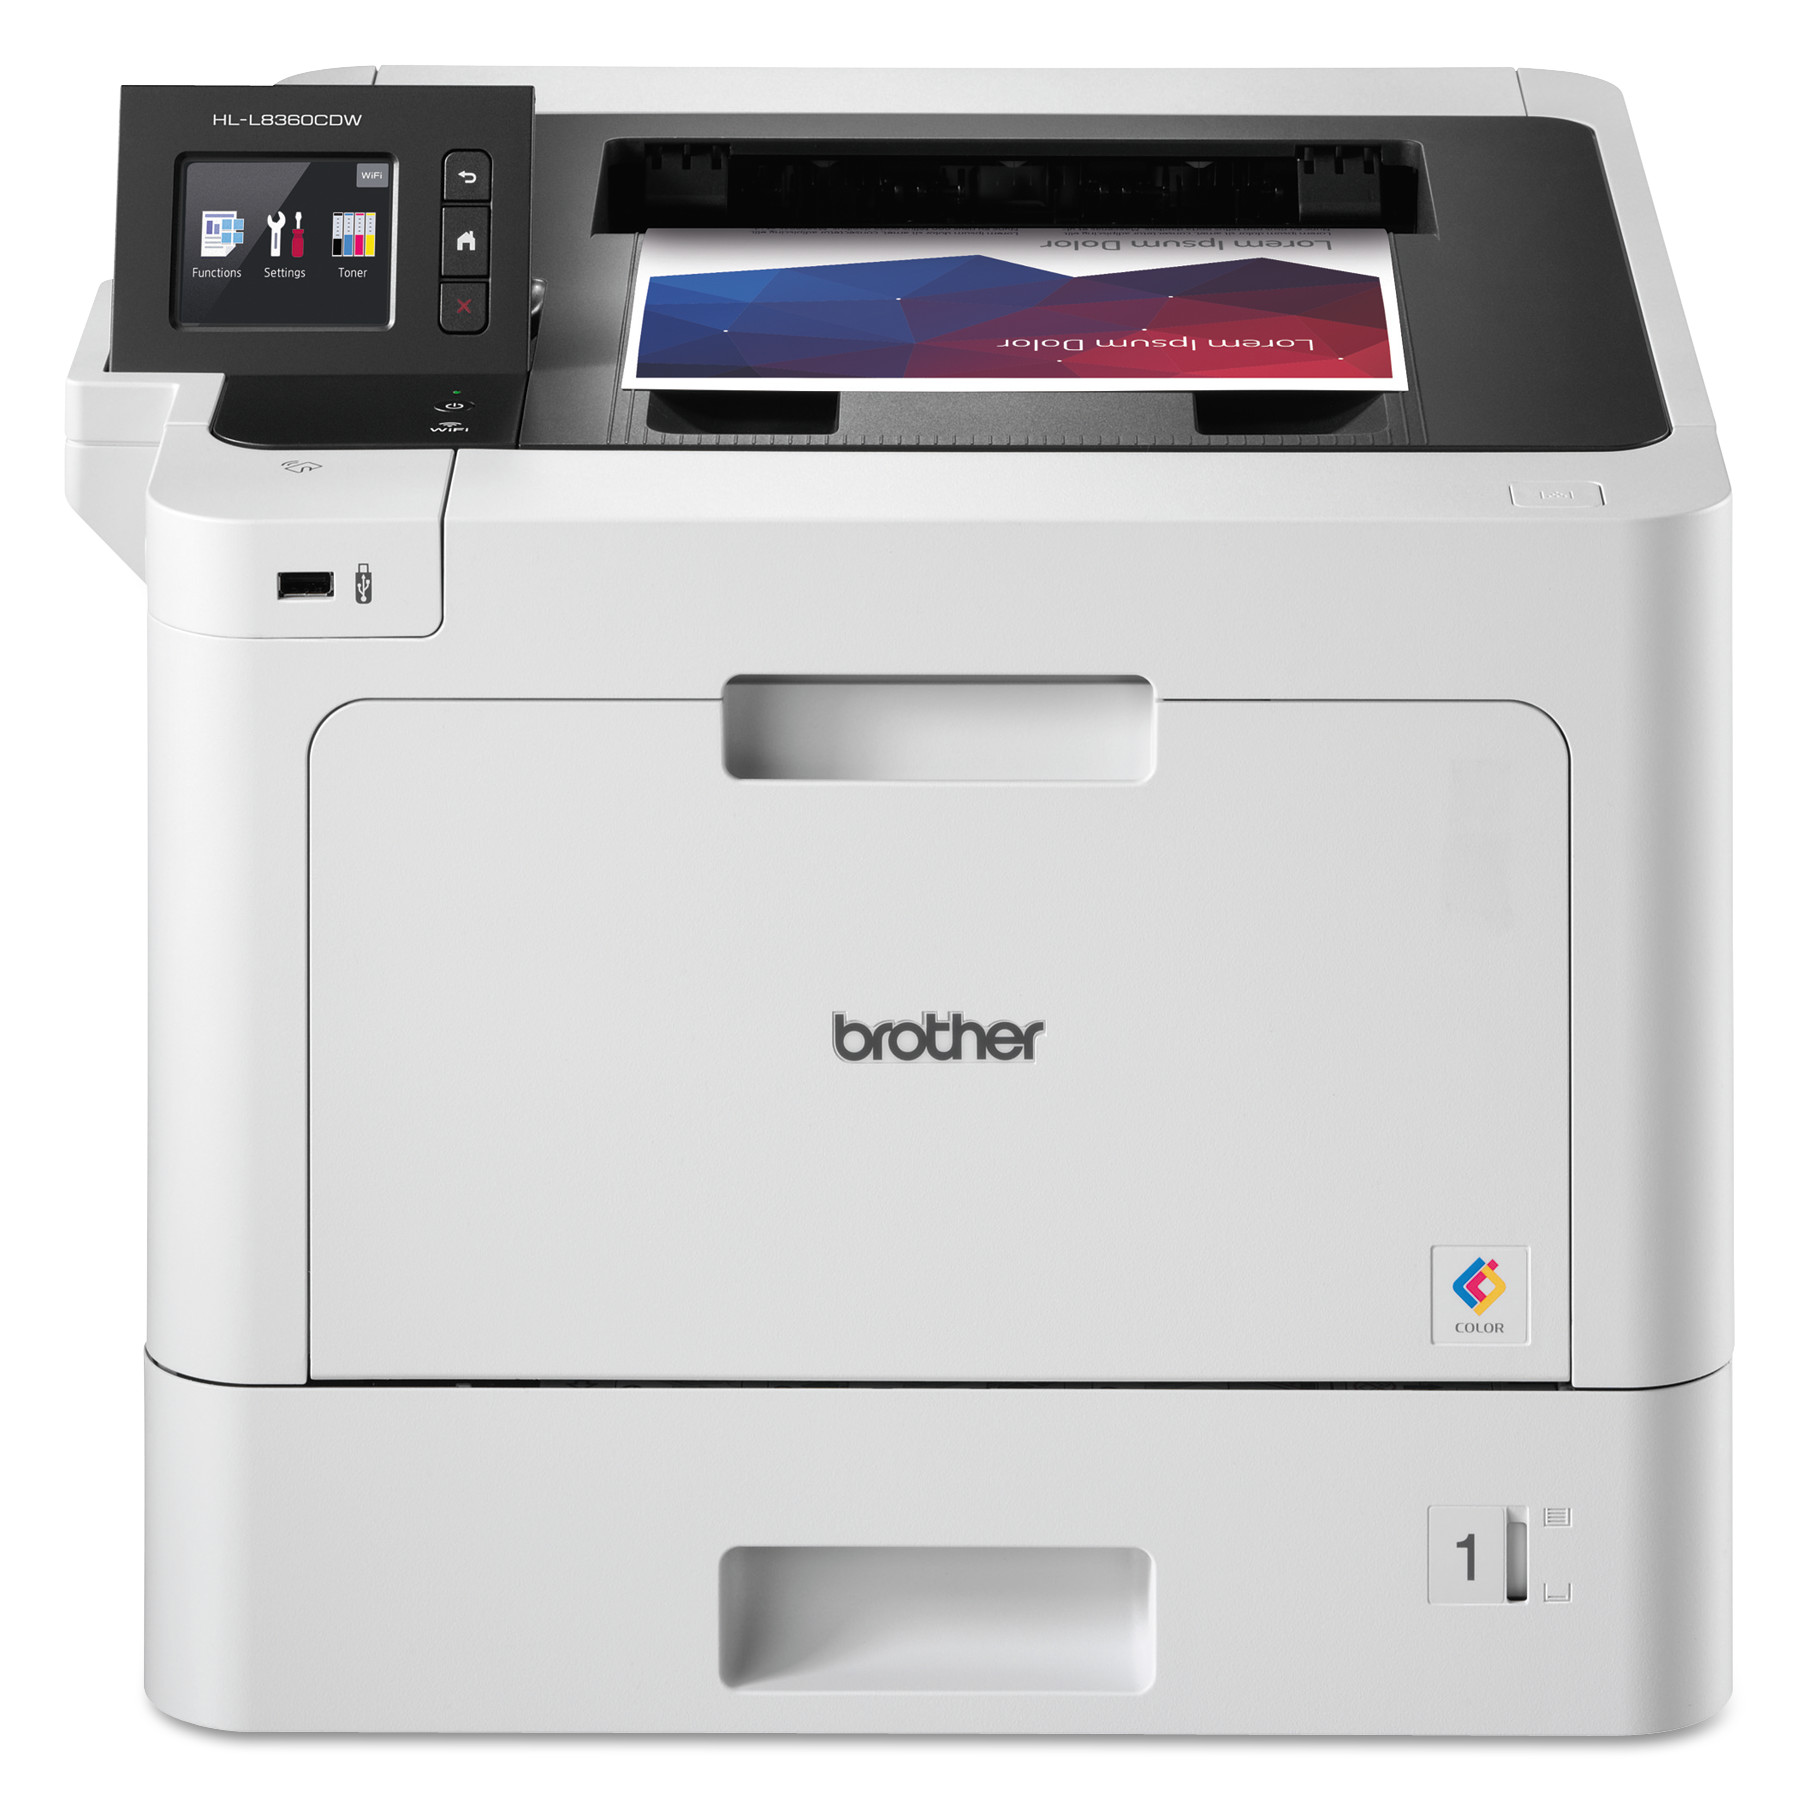 HL-L8360CDW Business Color Wireless Laser Printer, Duplex Printing